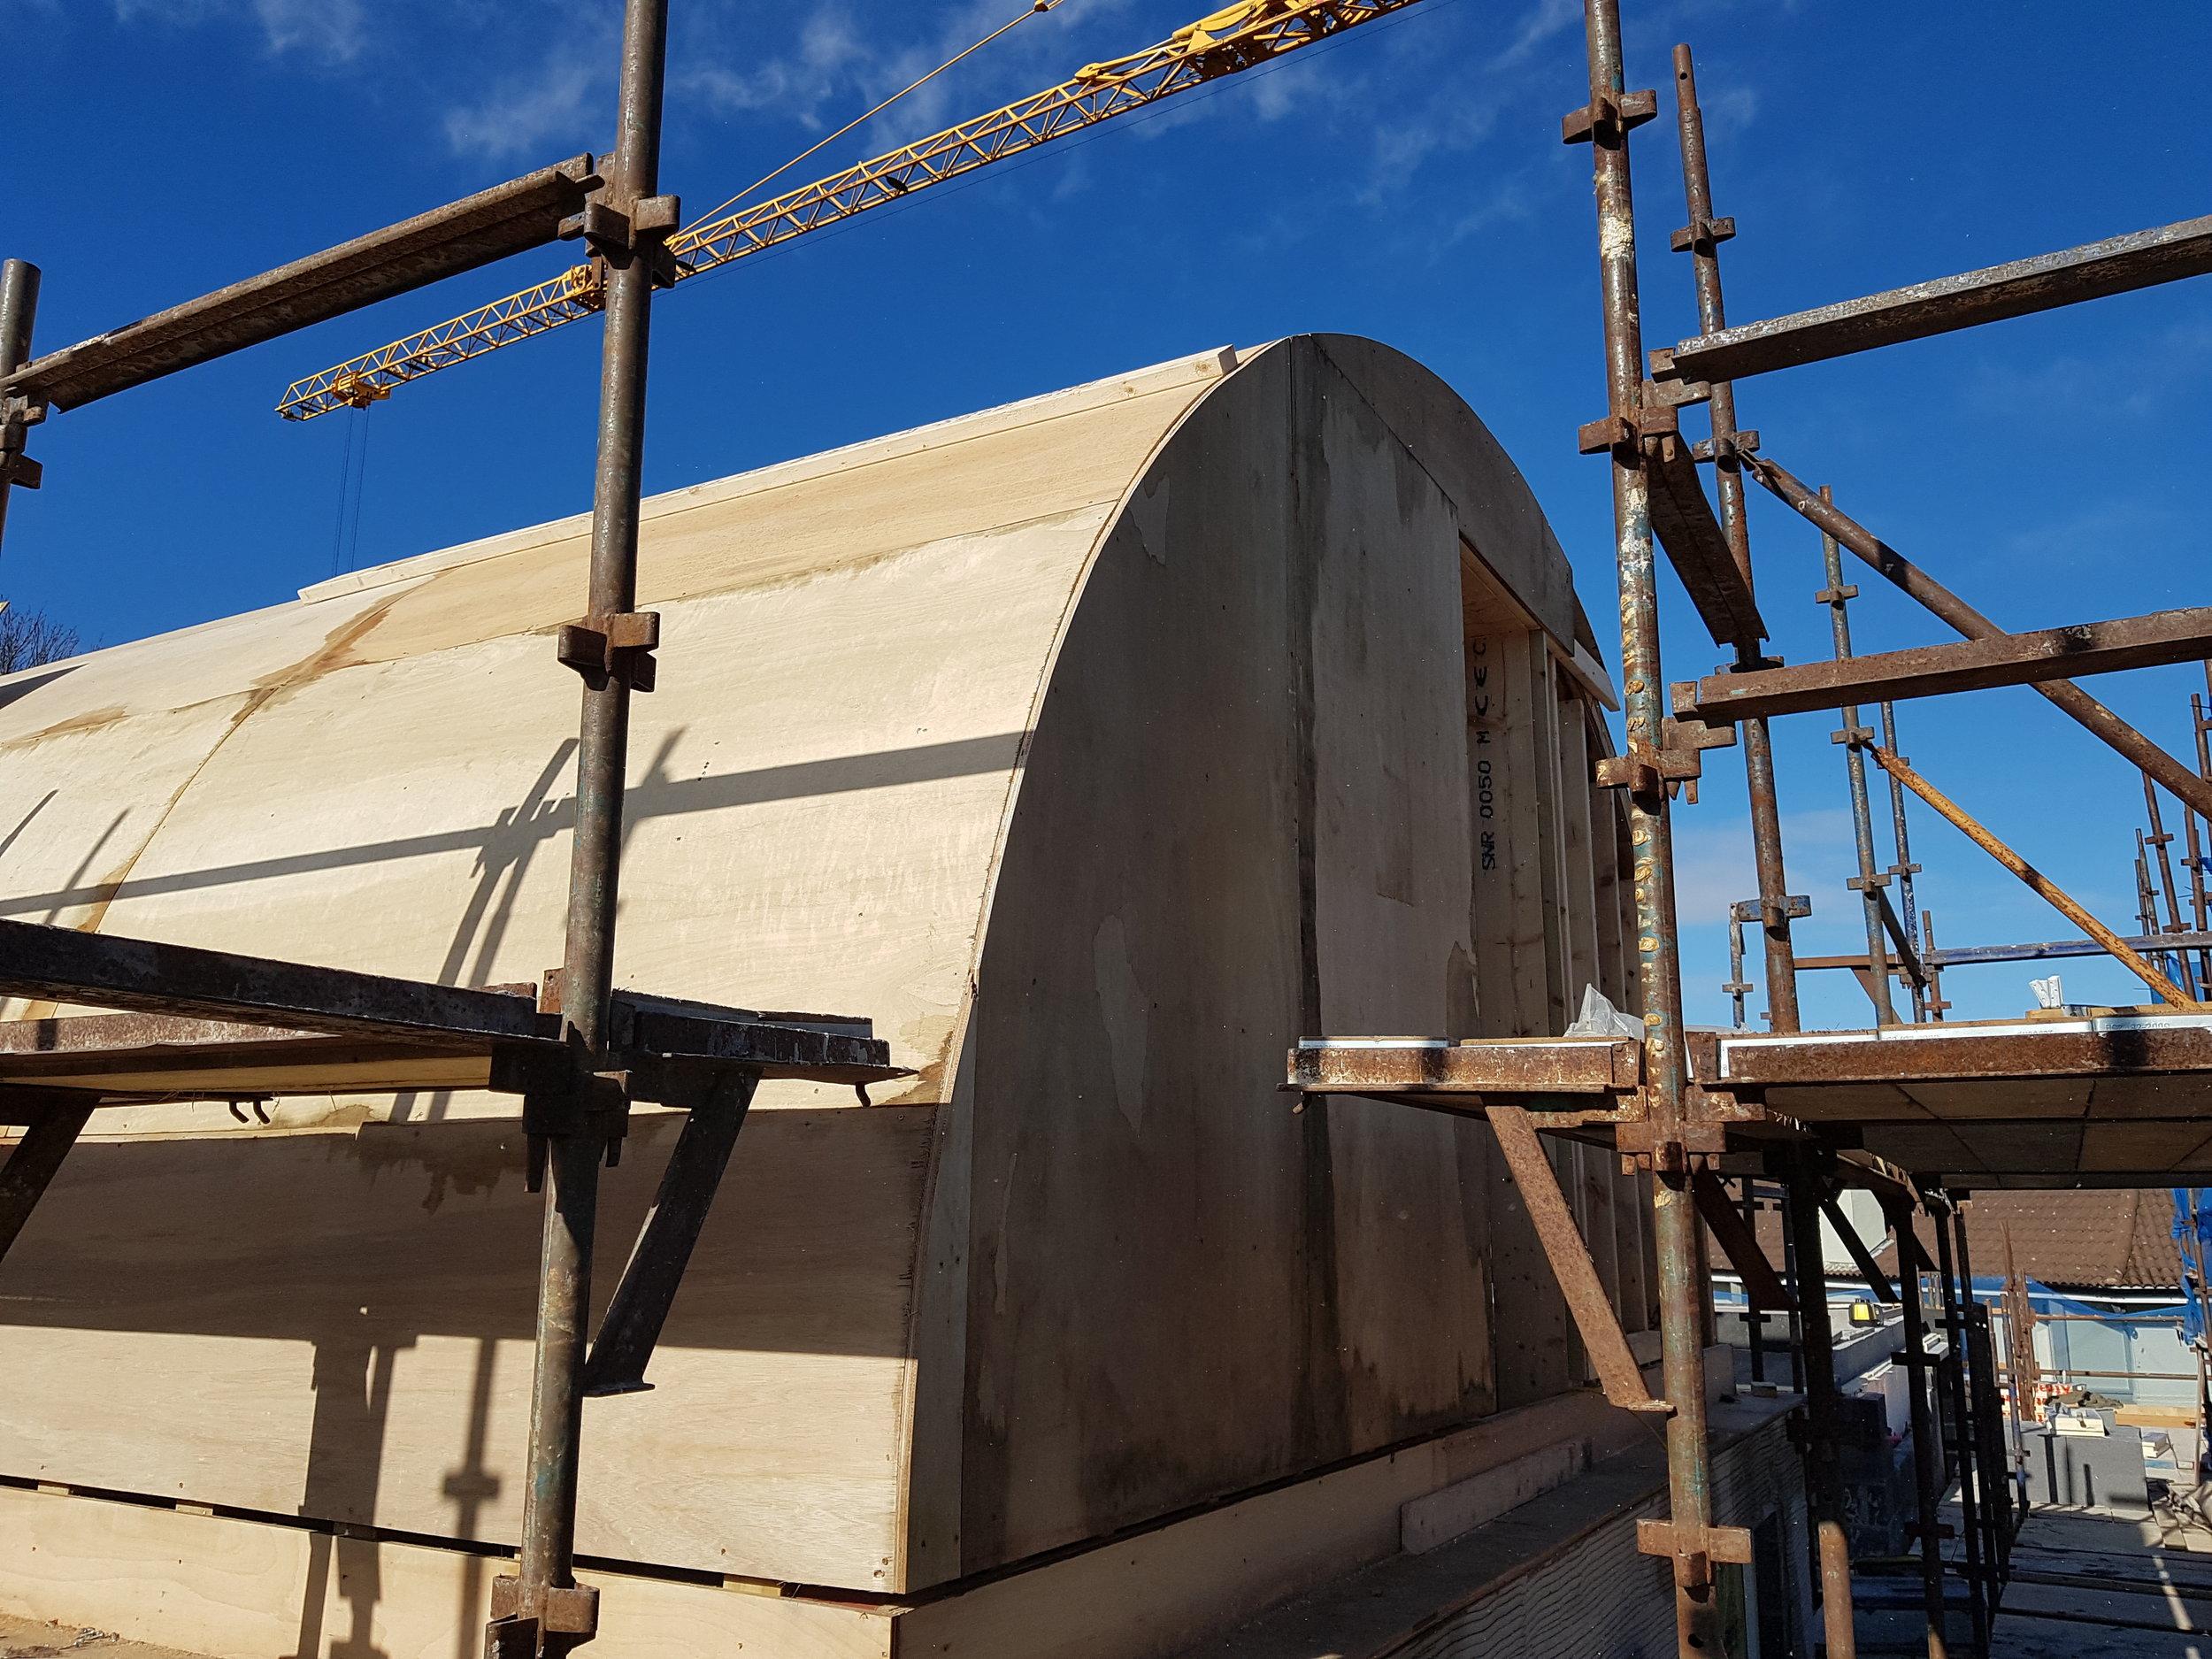 BARRELL ROOF CONSTRUCTION